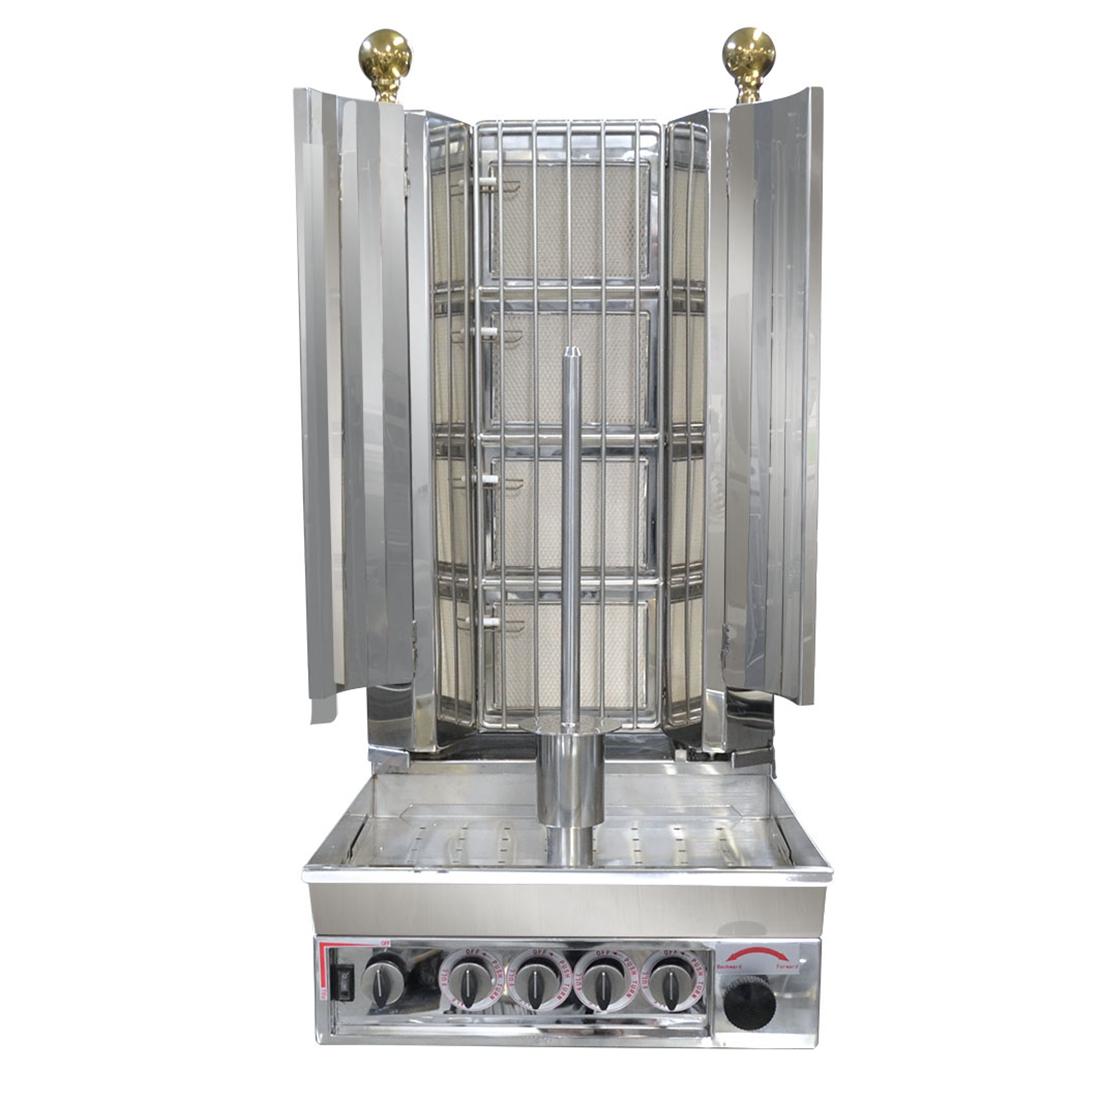 KMB4E Semi-automatic Kebab with Natural Gas 4 Burner